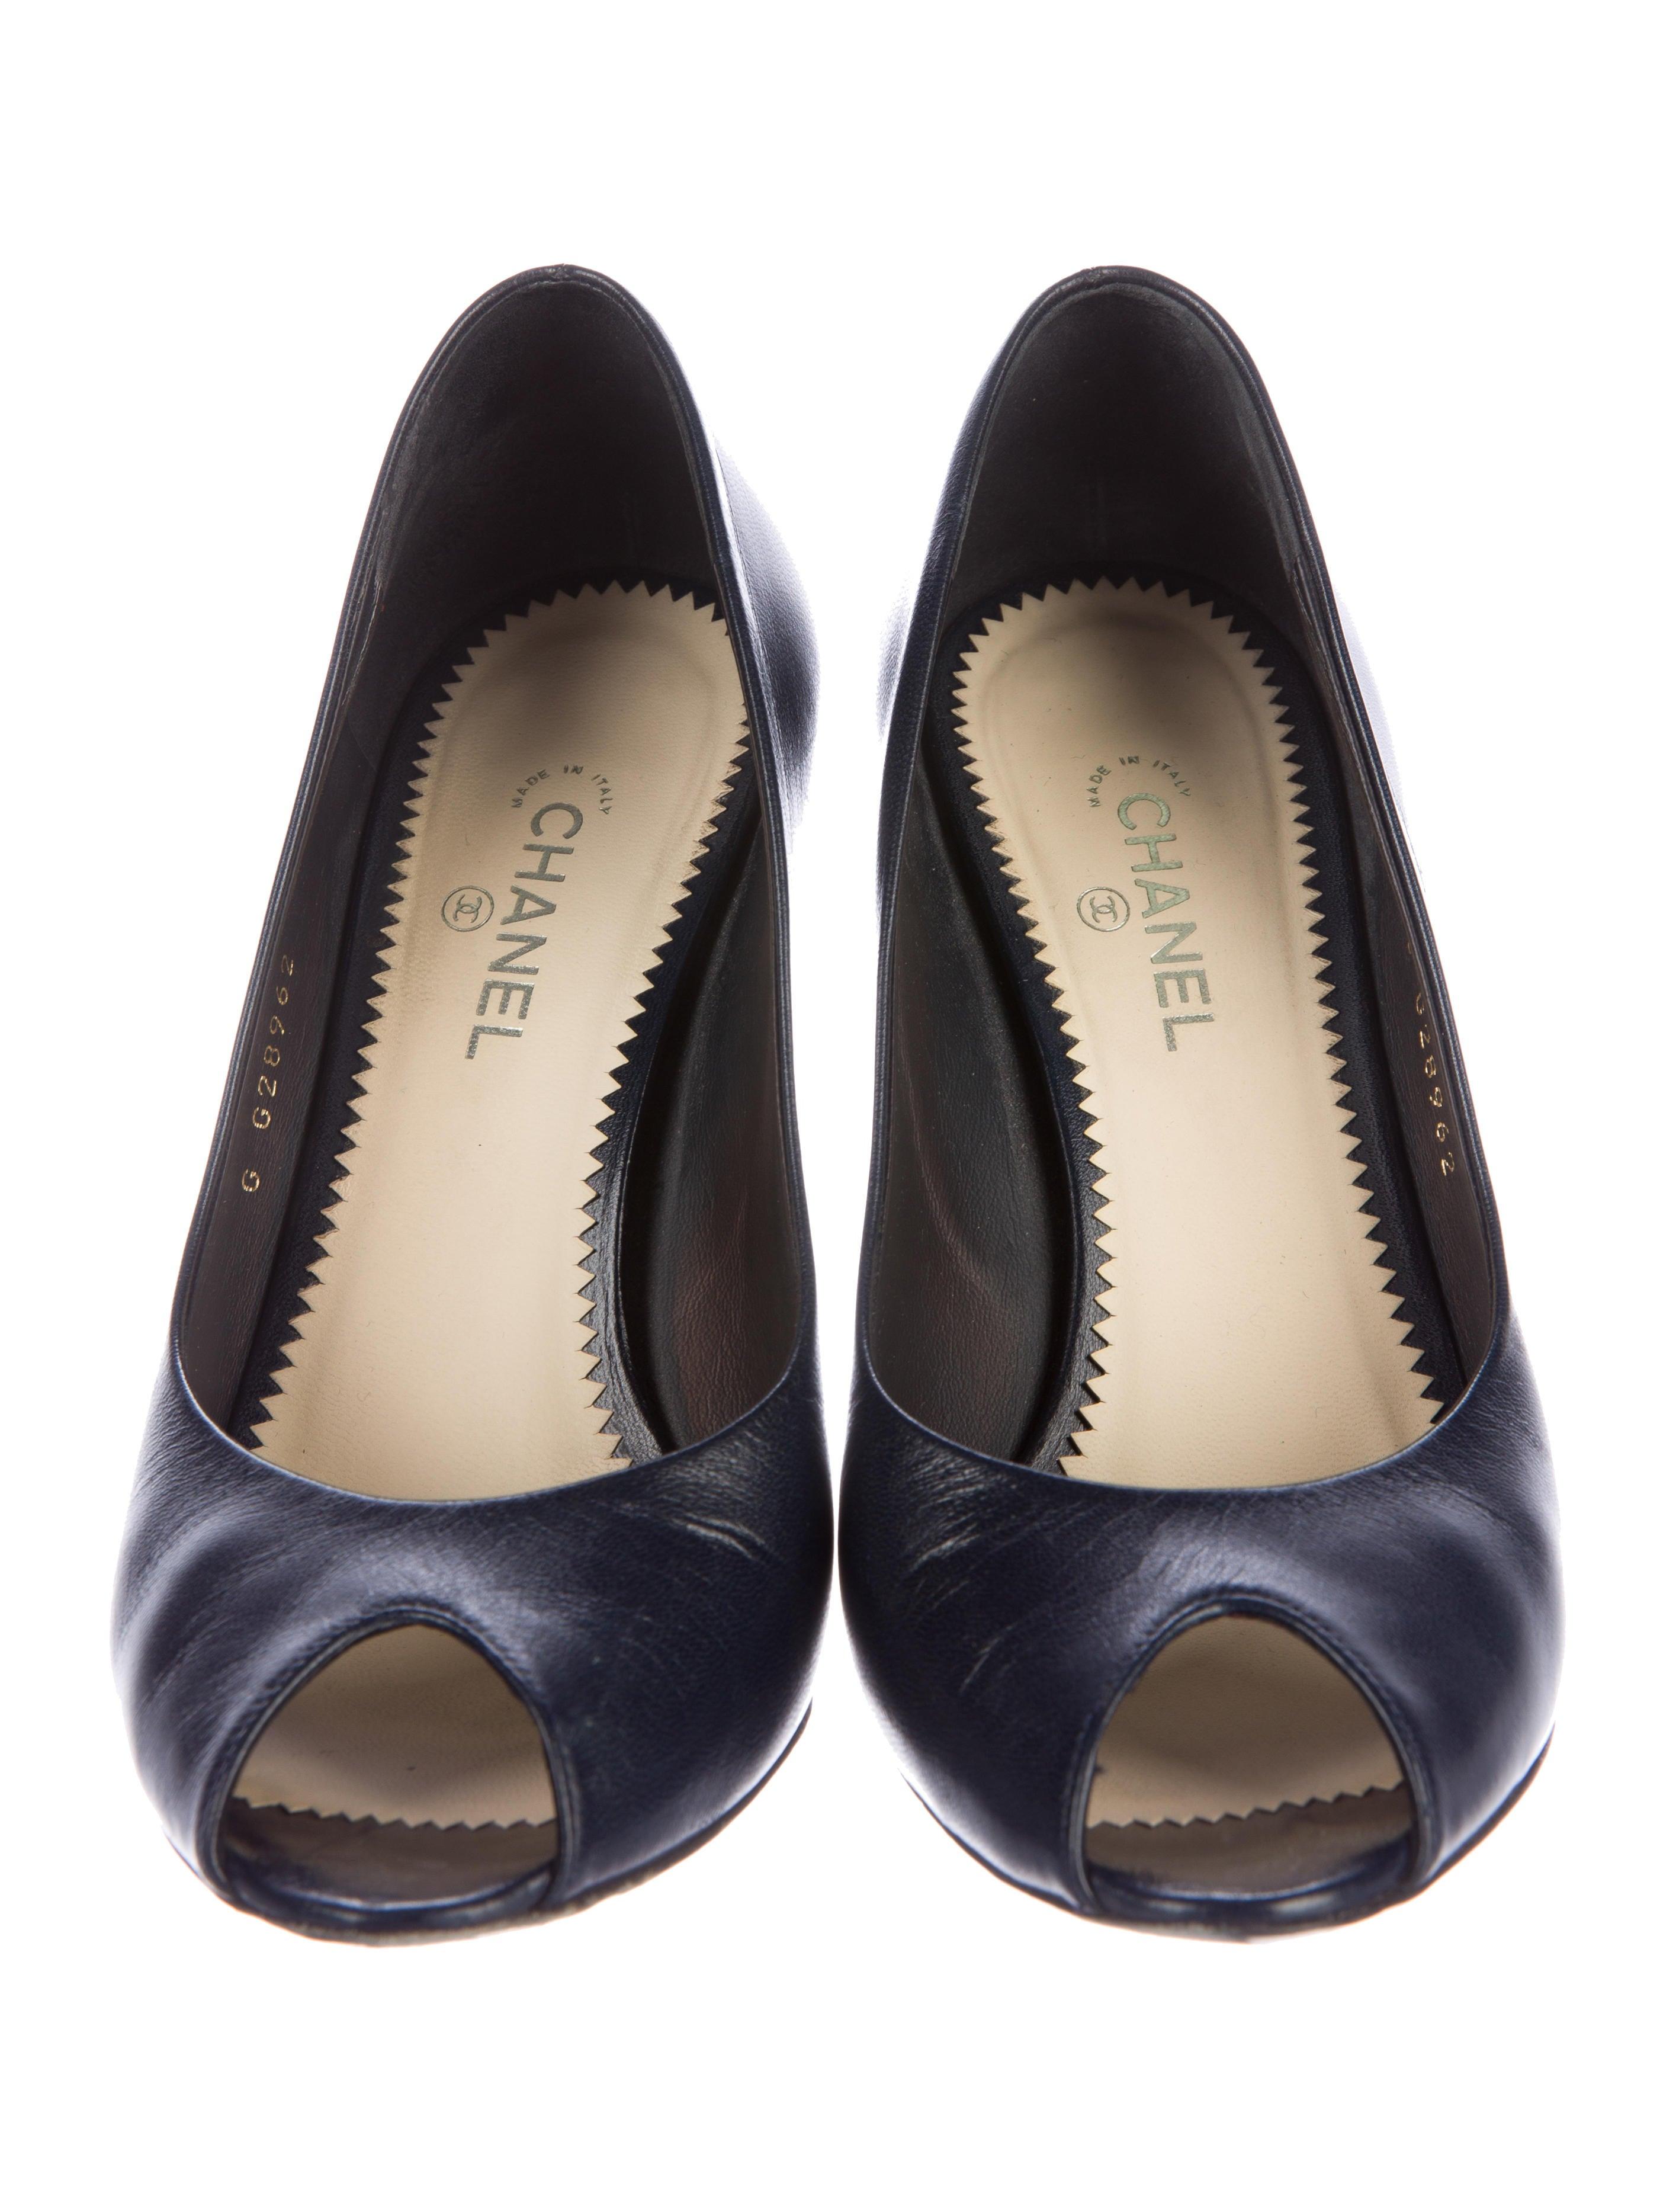 5de433d7c3 Chanel Booties With Pearls | MIT Hillel